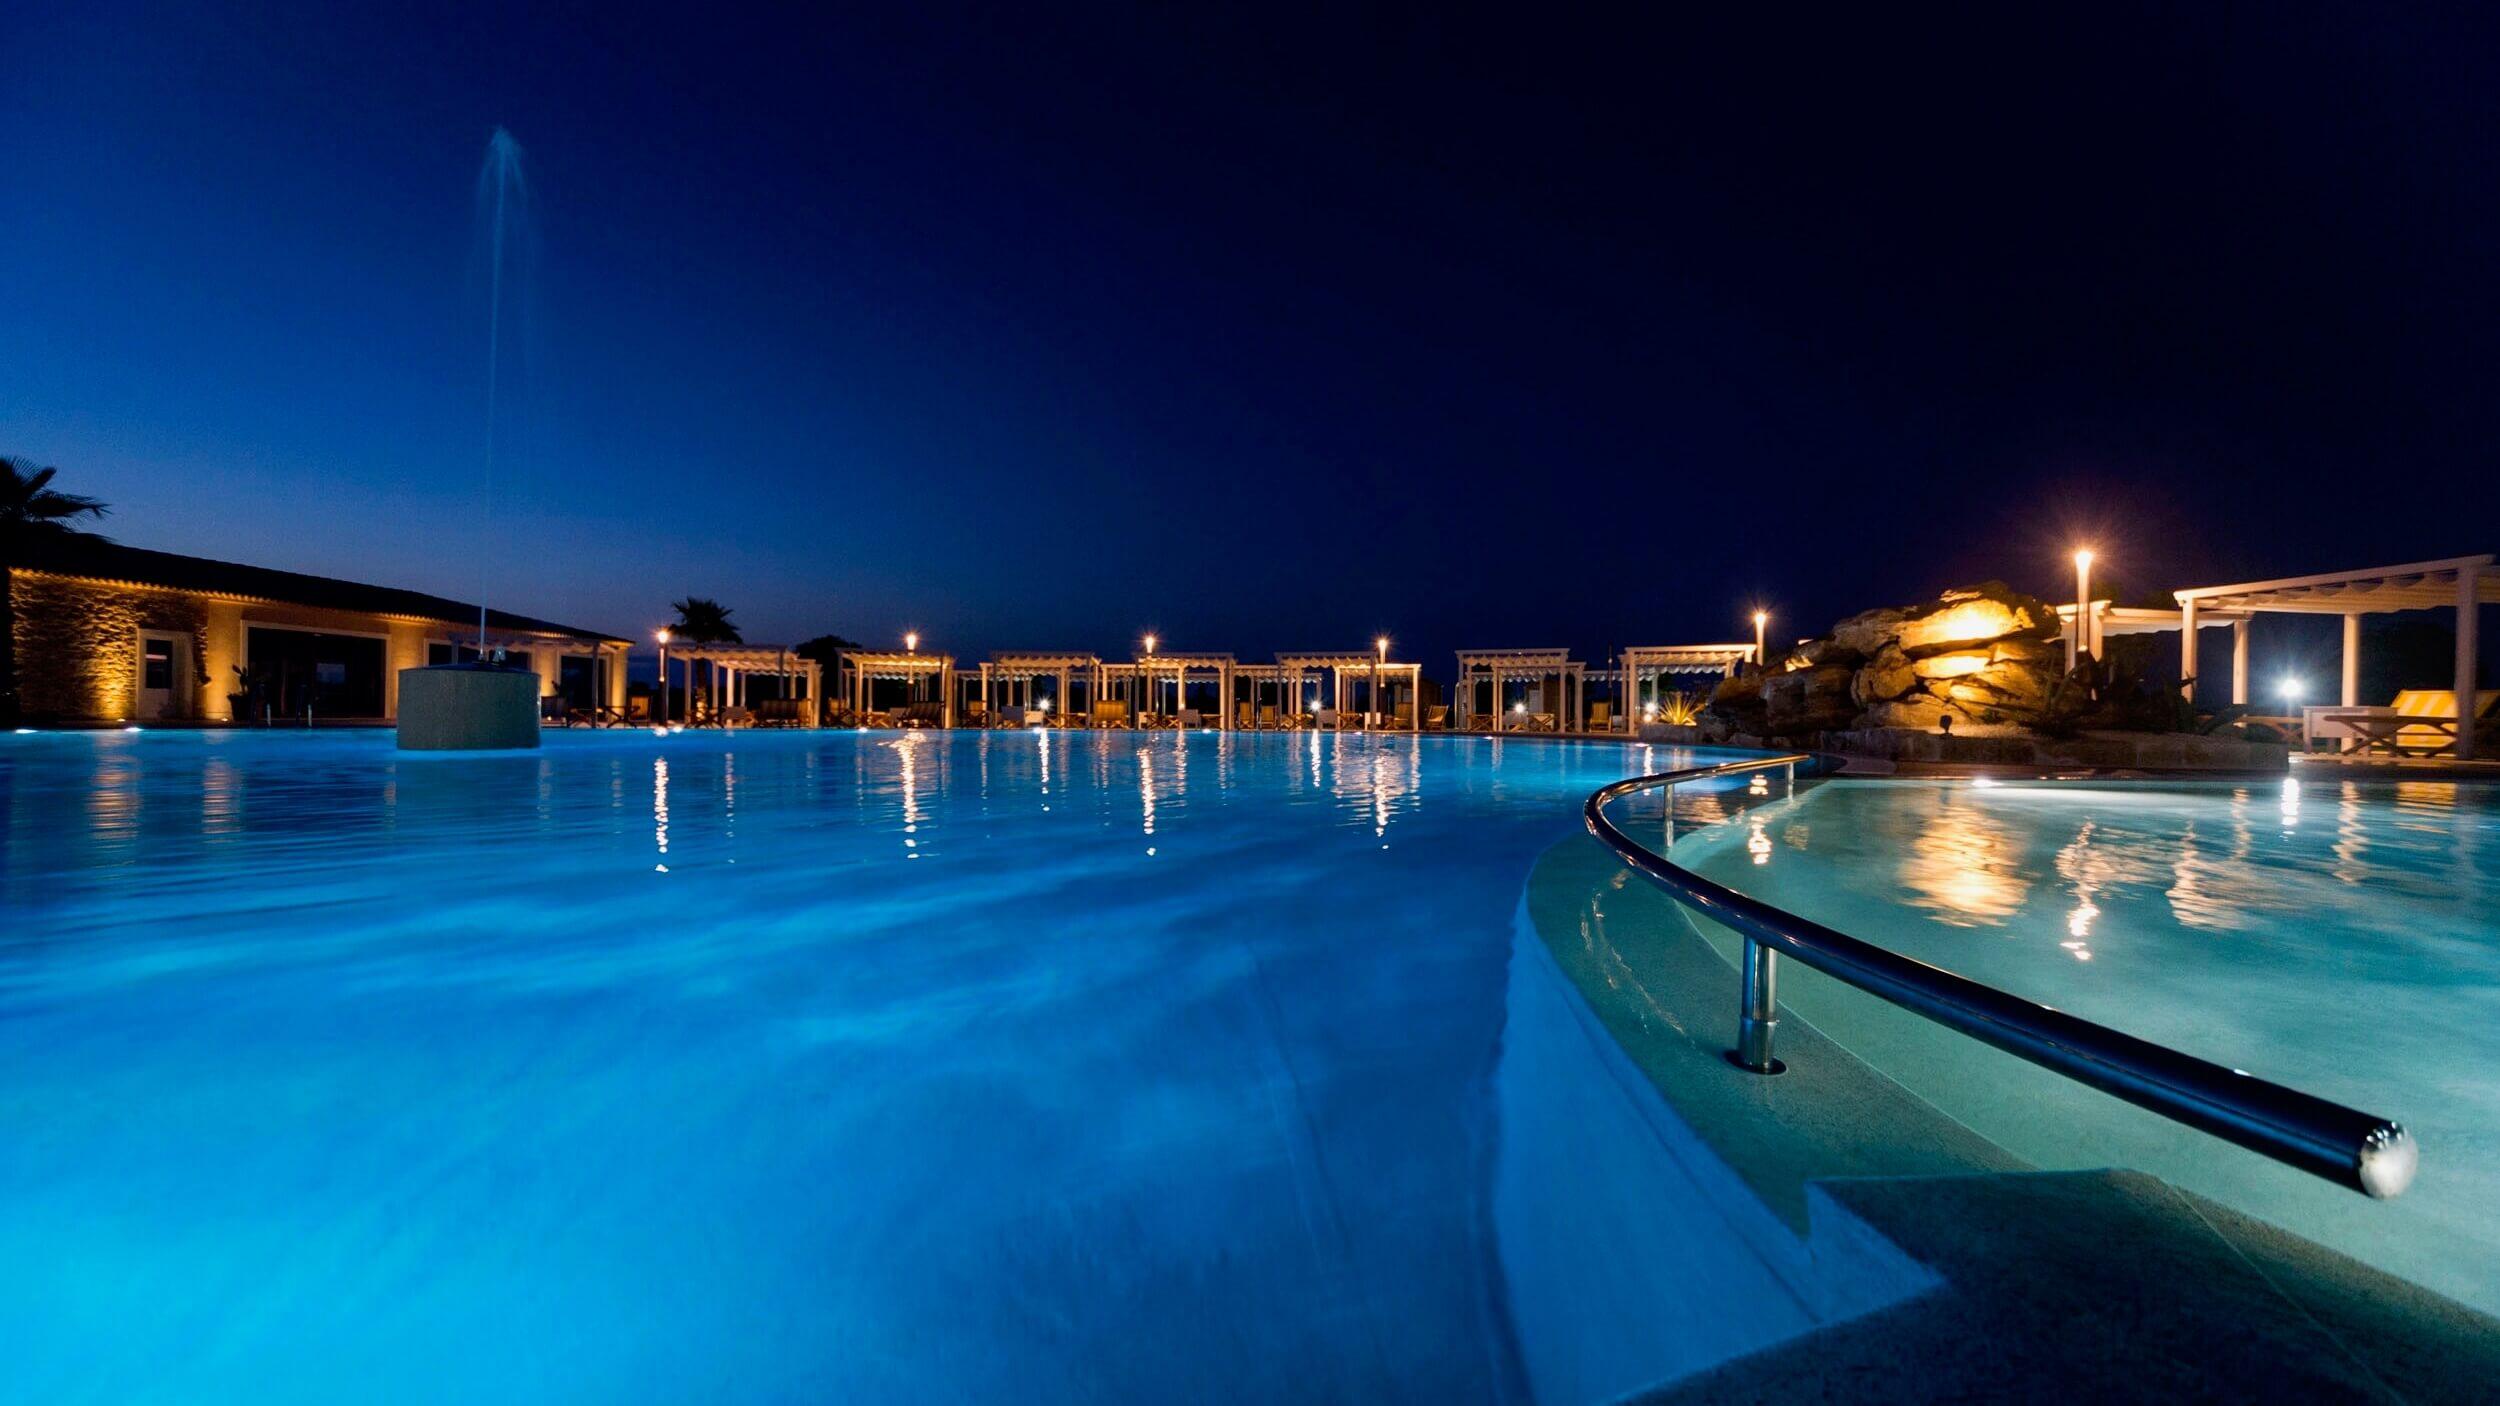 Piscina, relax, night, hotel casale milocca siraucusa